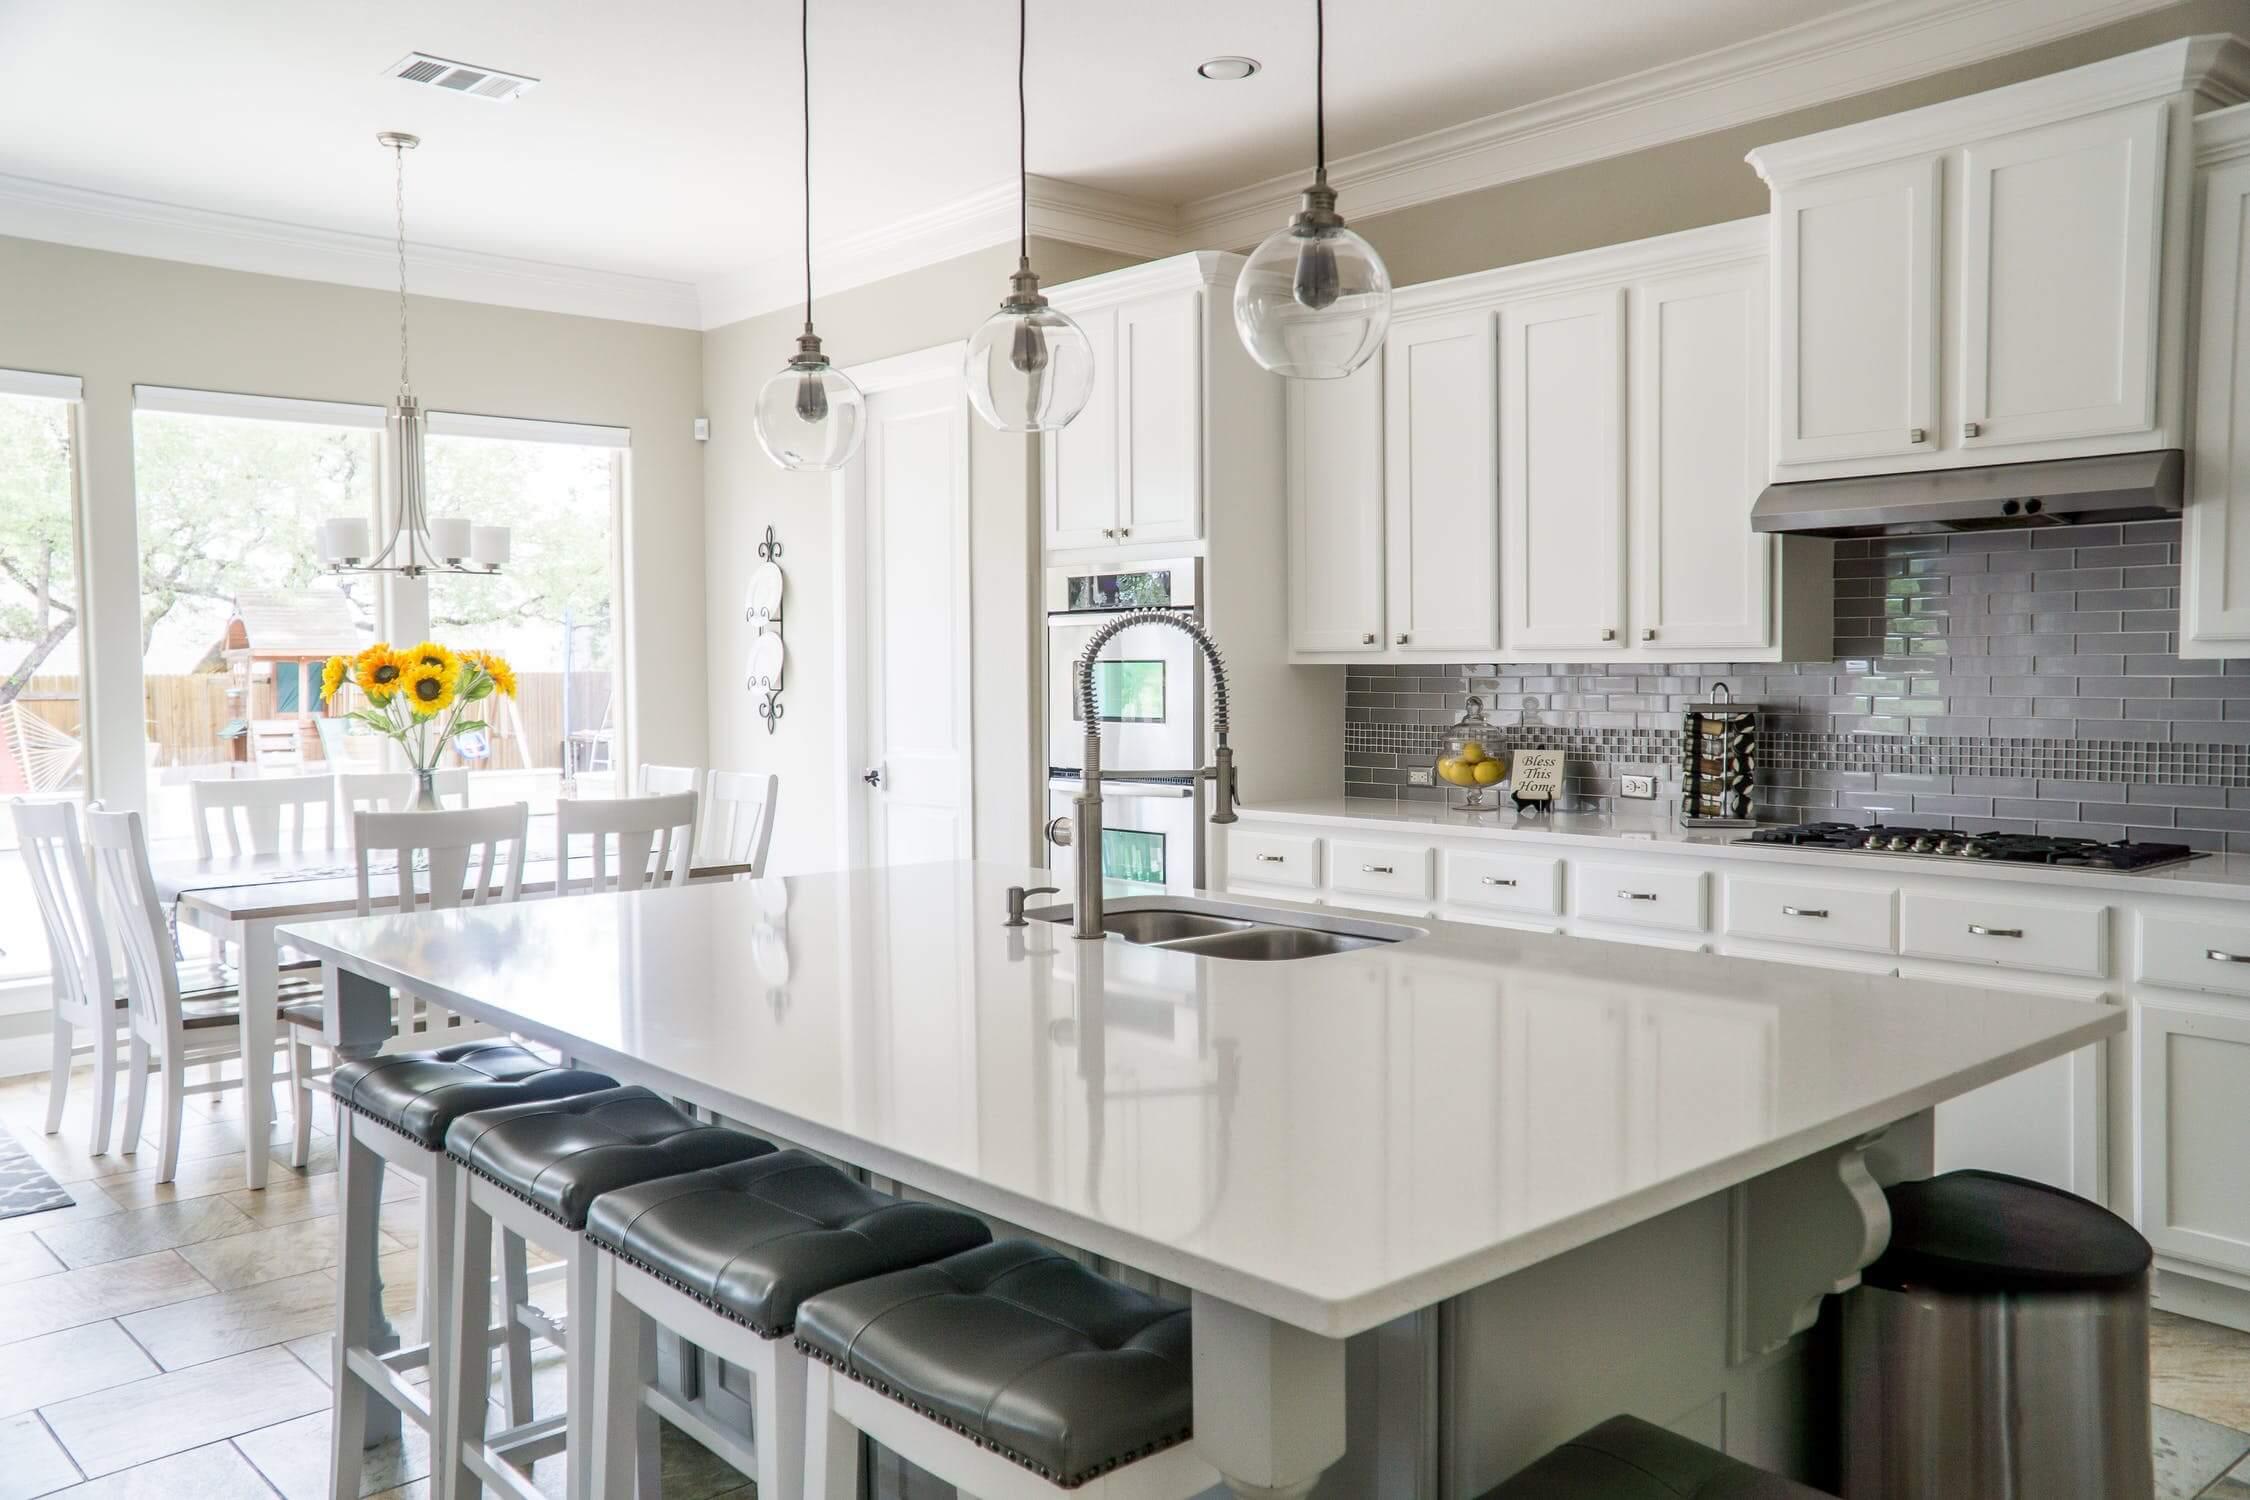 clean kitchen appliances